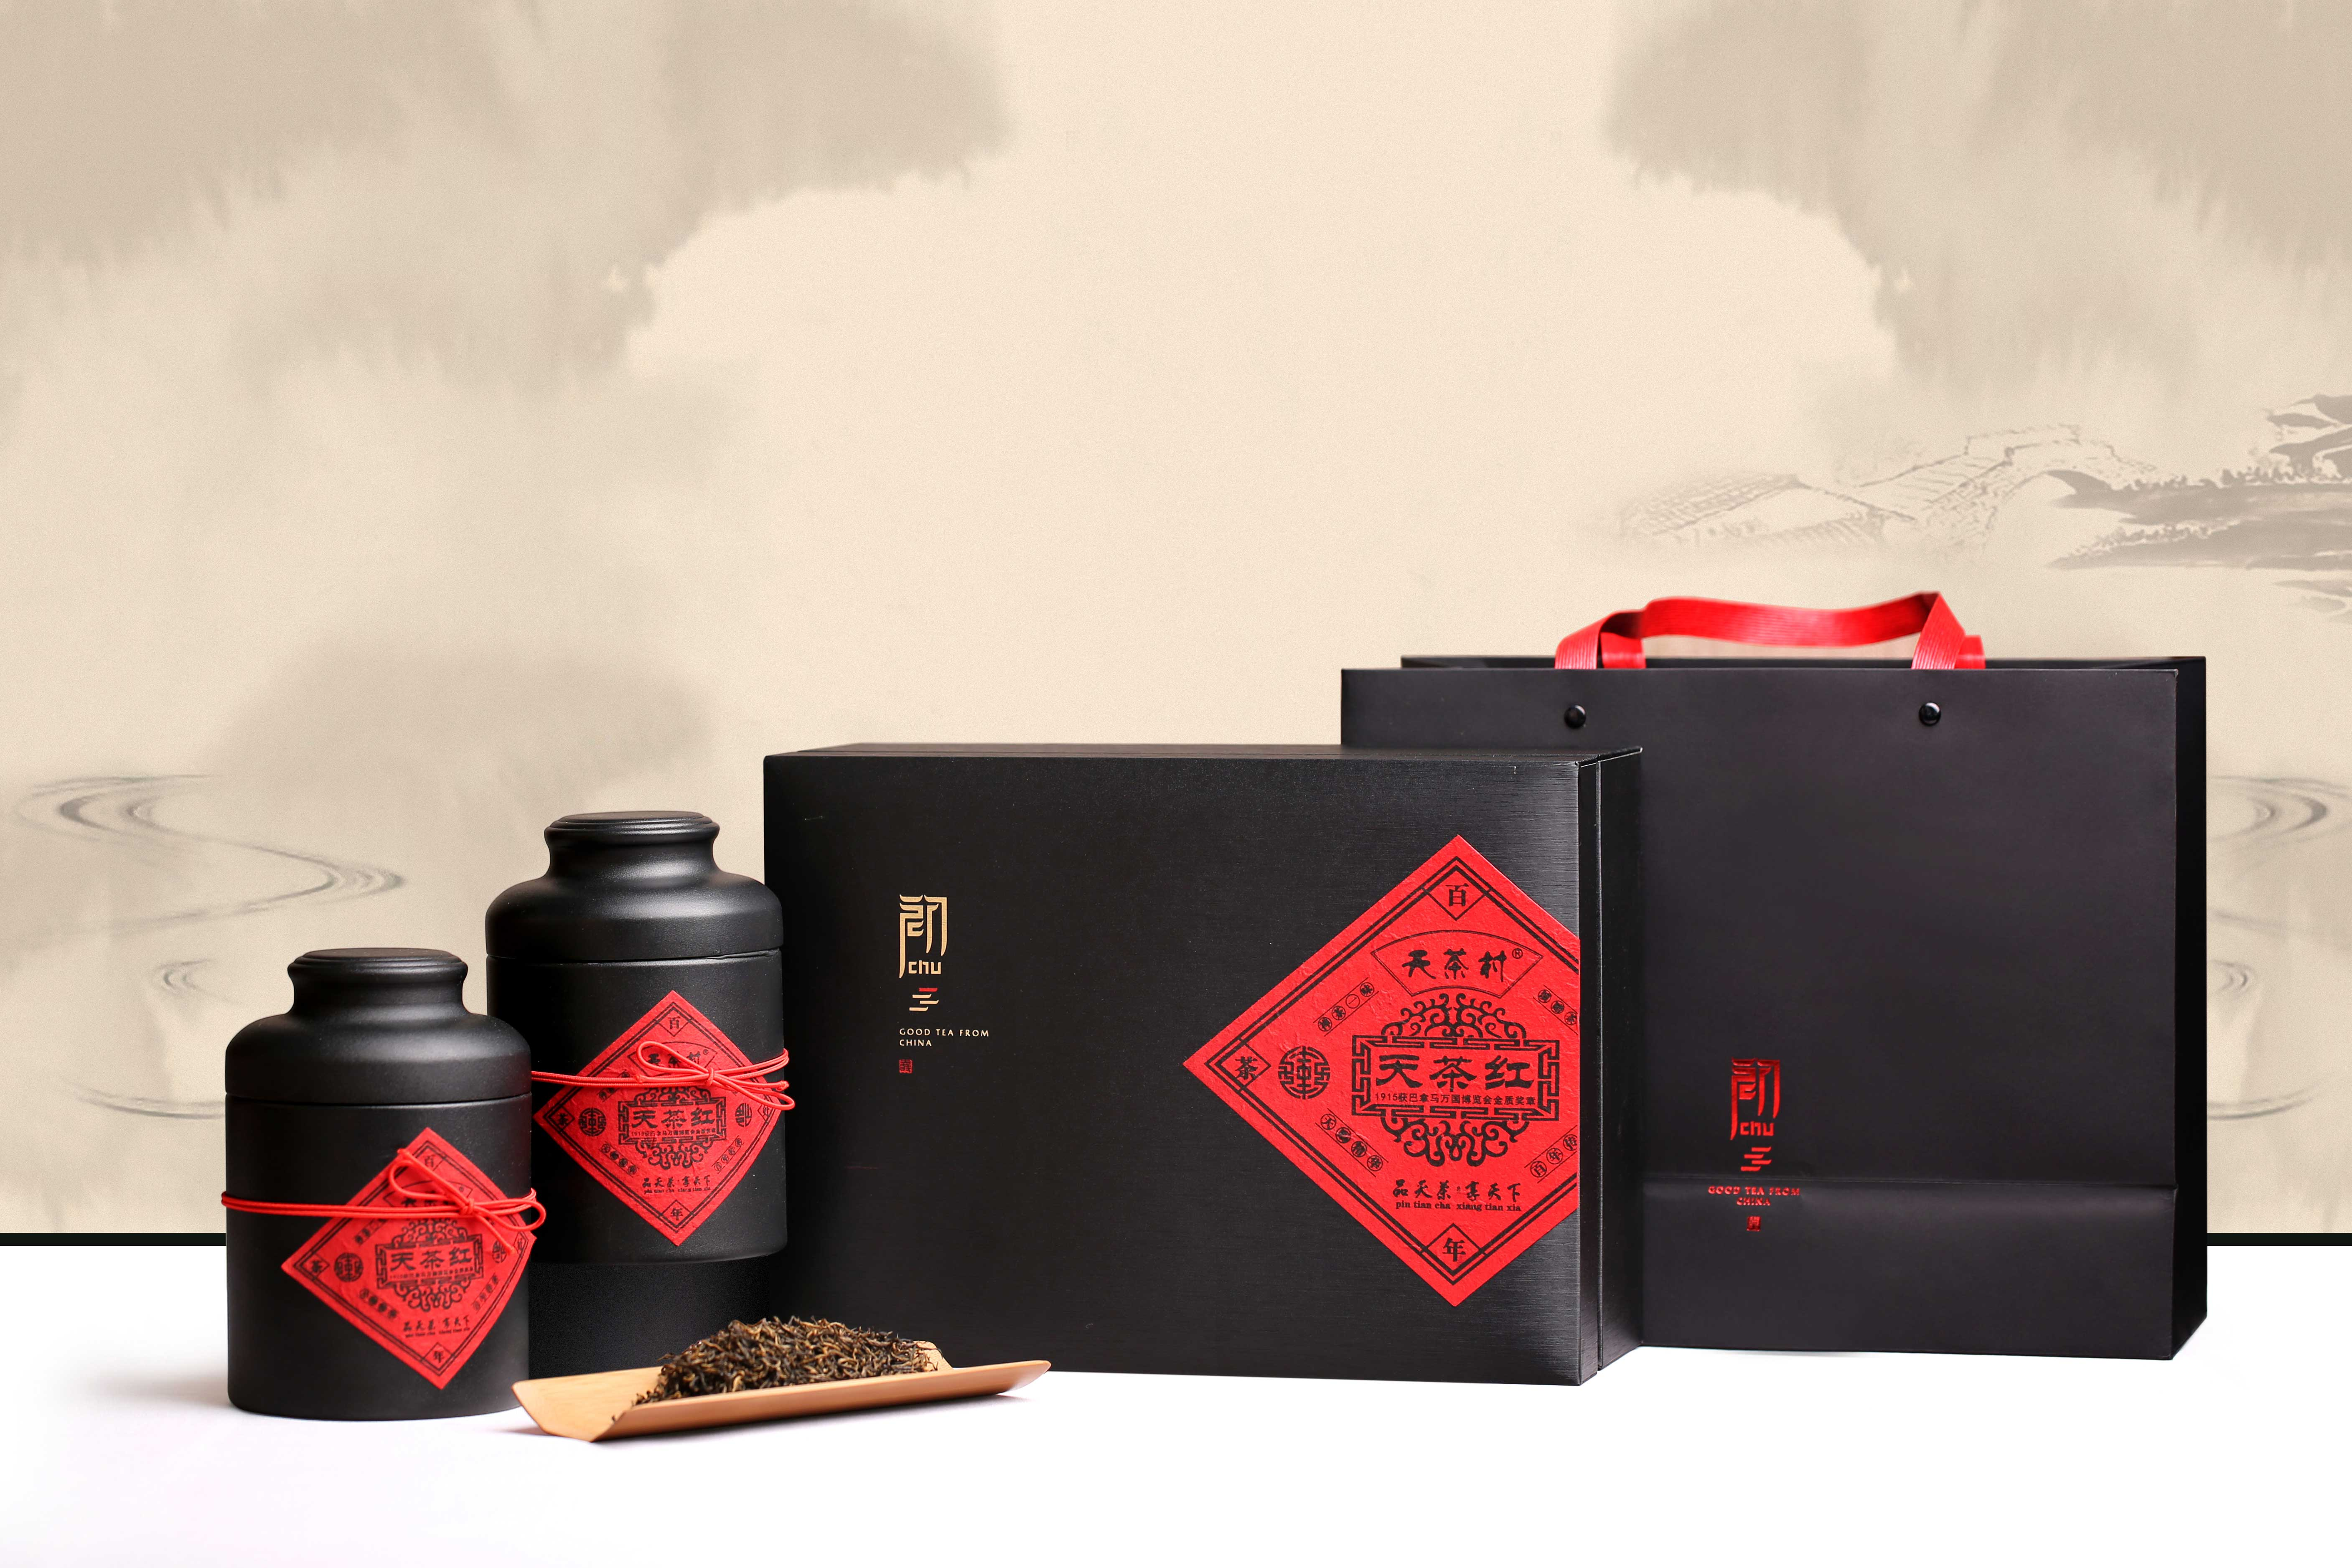 title='天茶园有机红茶生铁罐装(特级天茶红 礼盒装 100g*2罐 )'